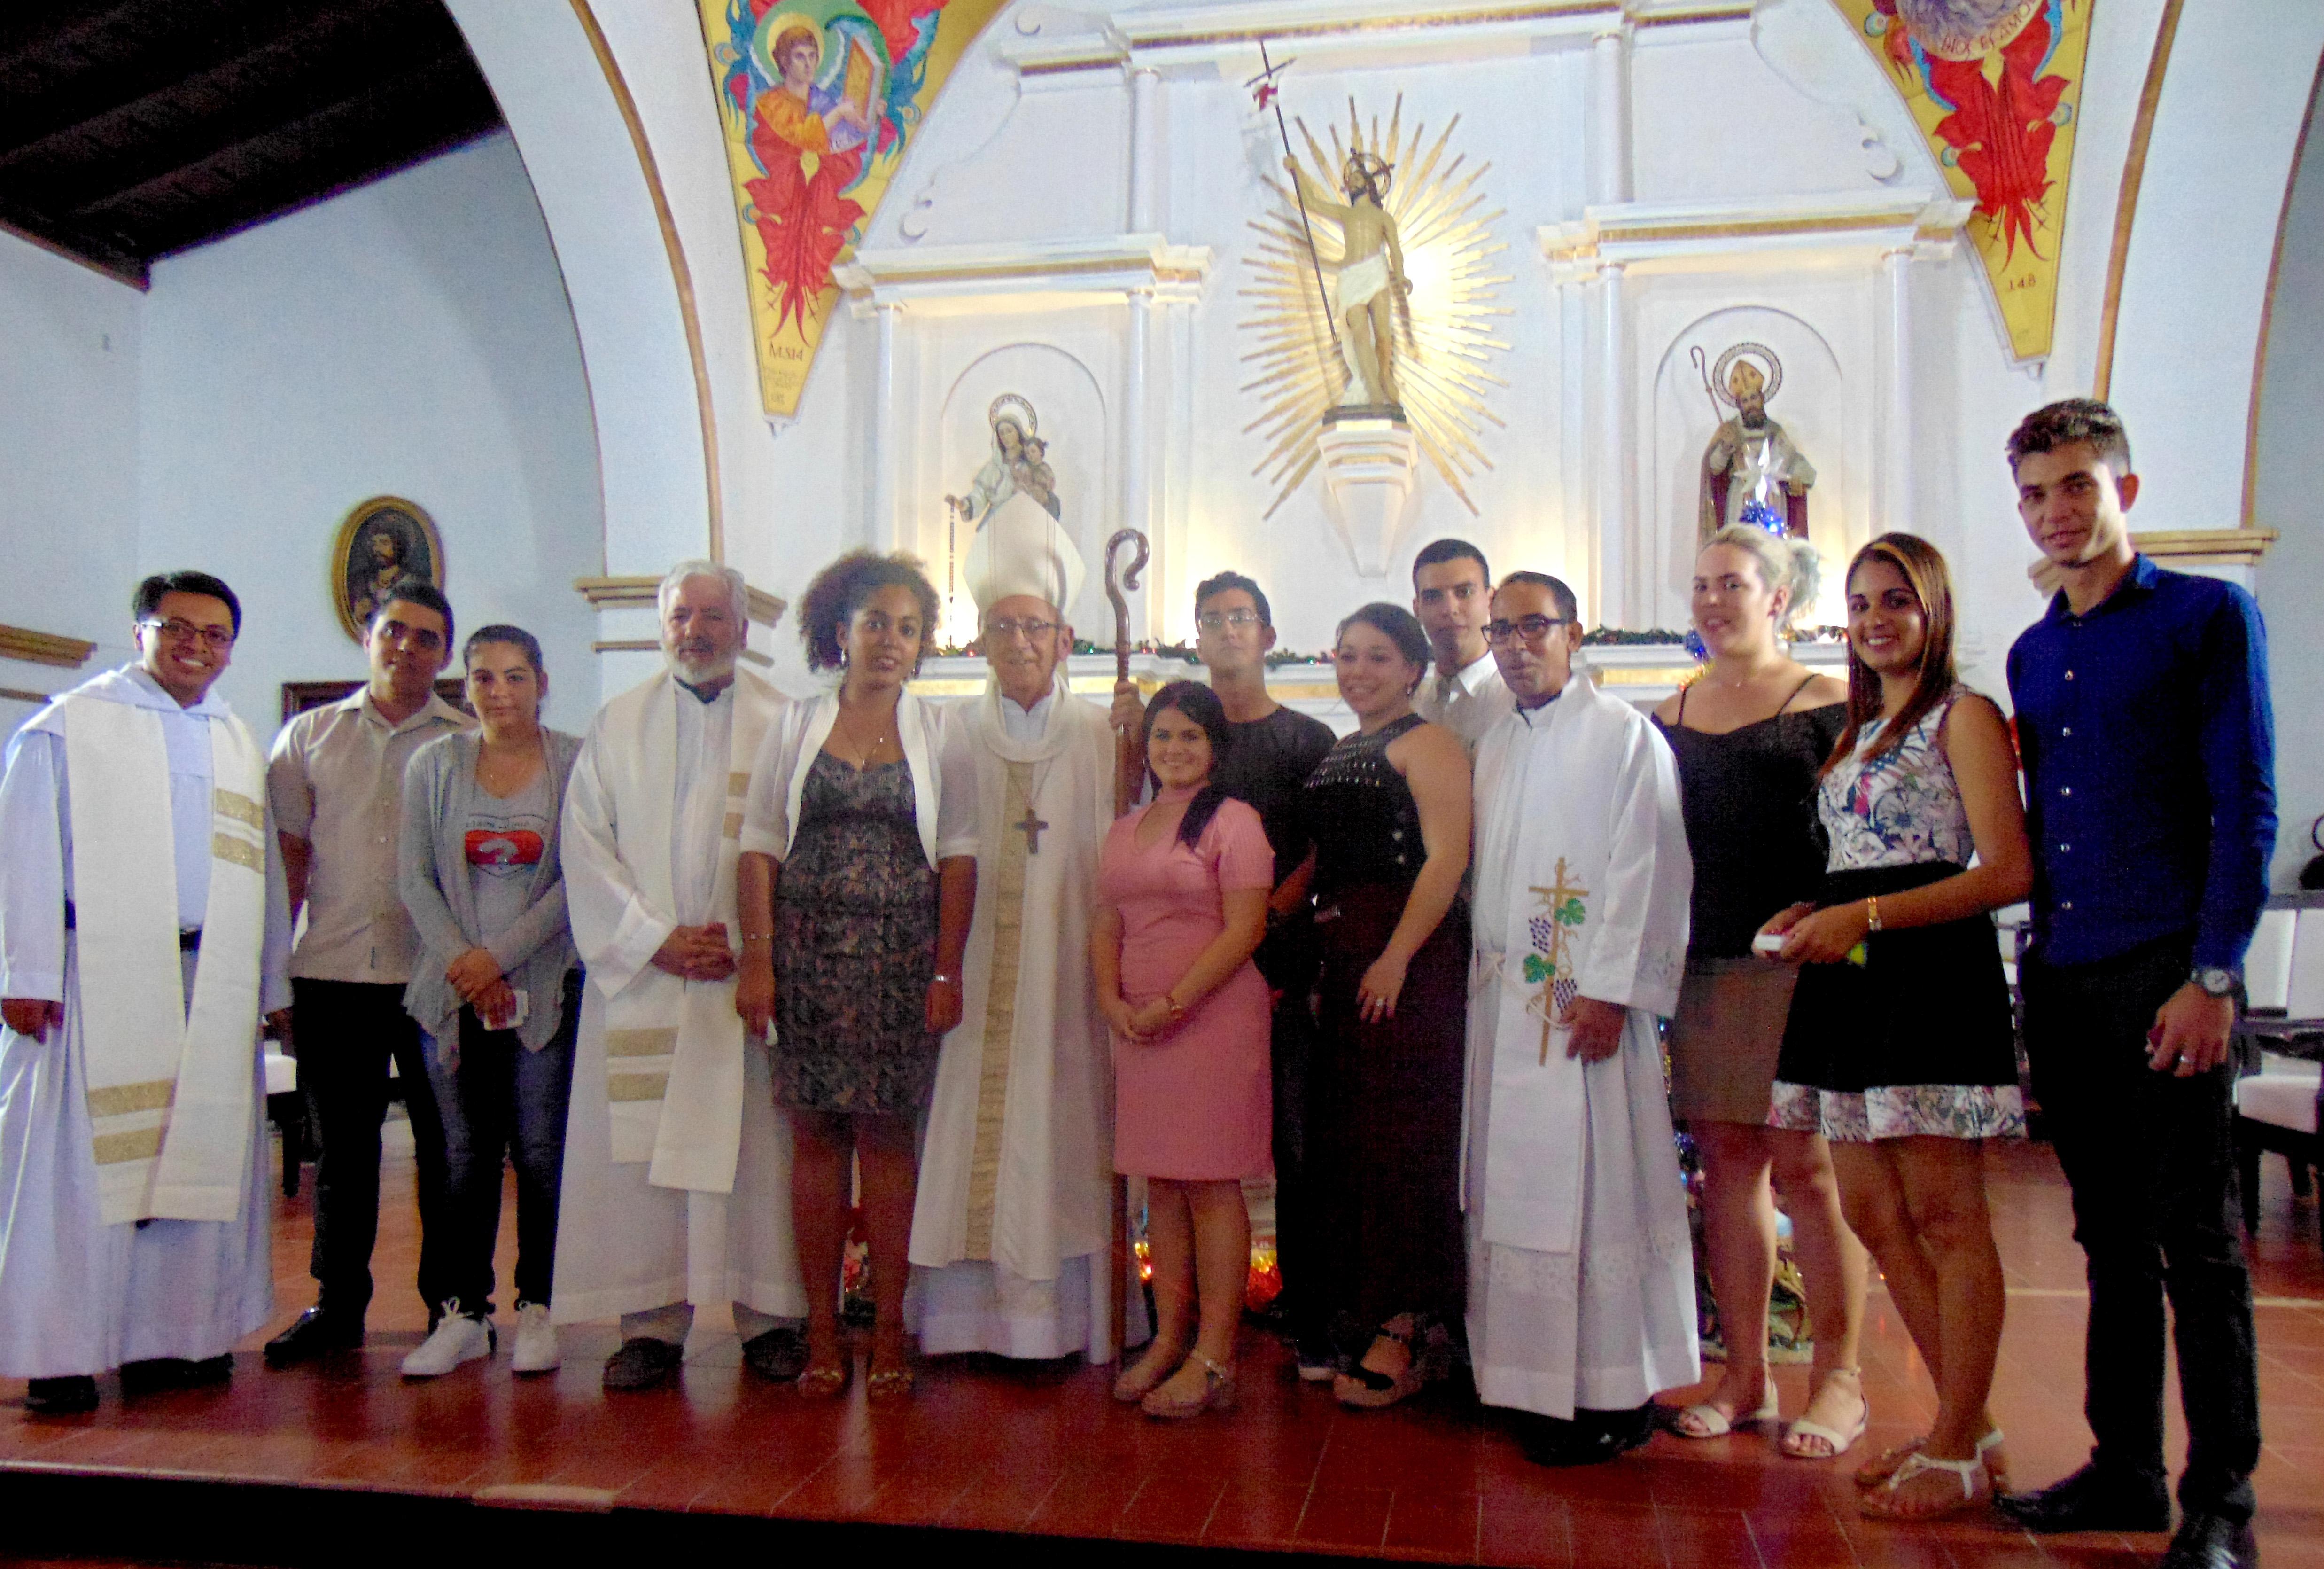 Envío de jóvenes de la Diócesis de Holguín, Cuba, a la JMJ de Panamá © Maria Luisa Pérez Galvez